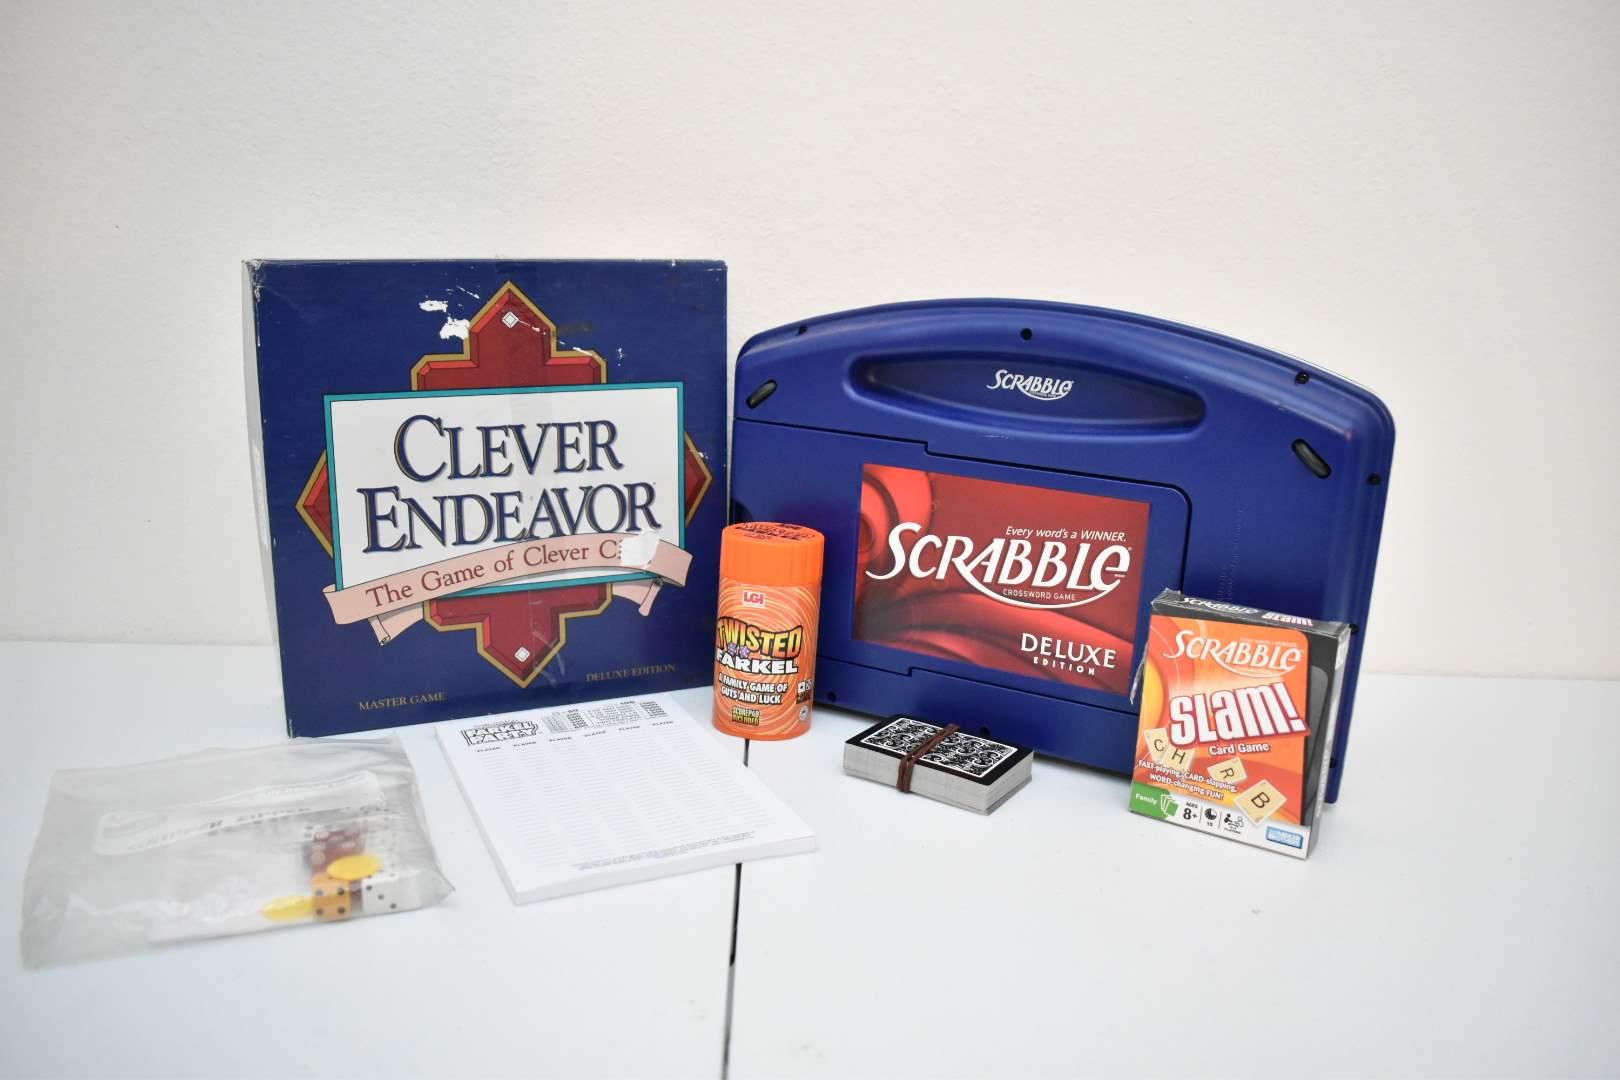 Games: Clever Endeavor, Scrabble Deluxe Edition, Scrabble Slam, Yahtzee, Farkel